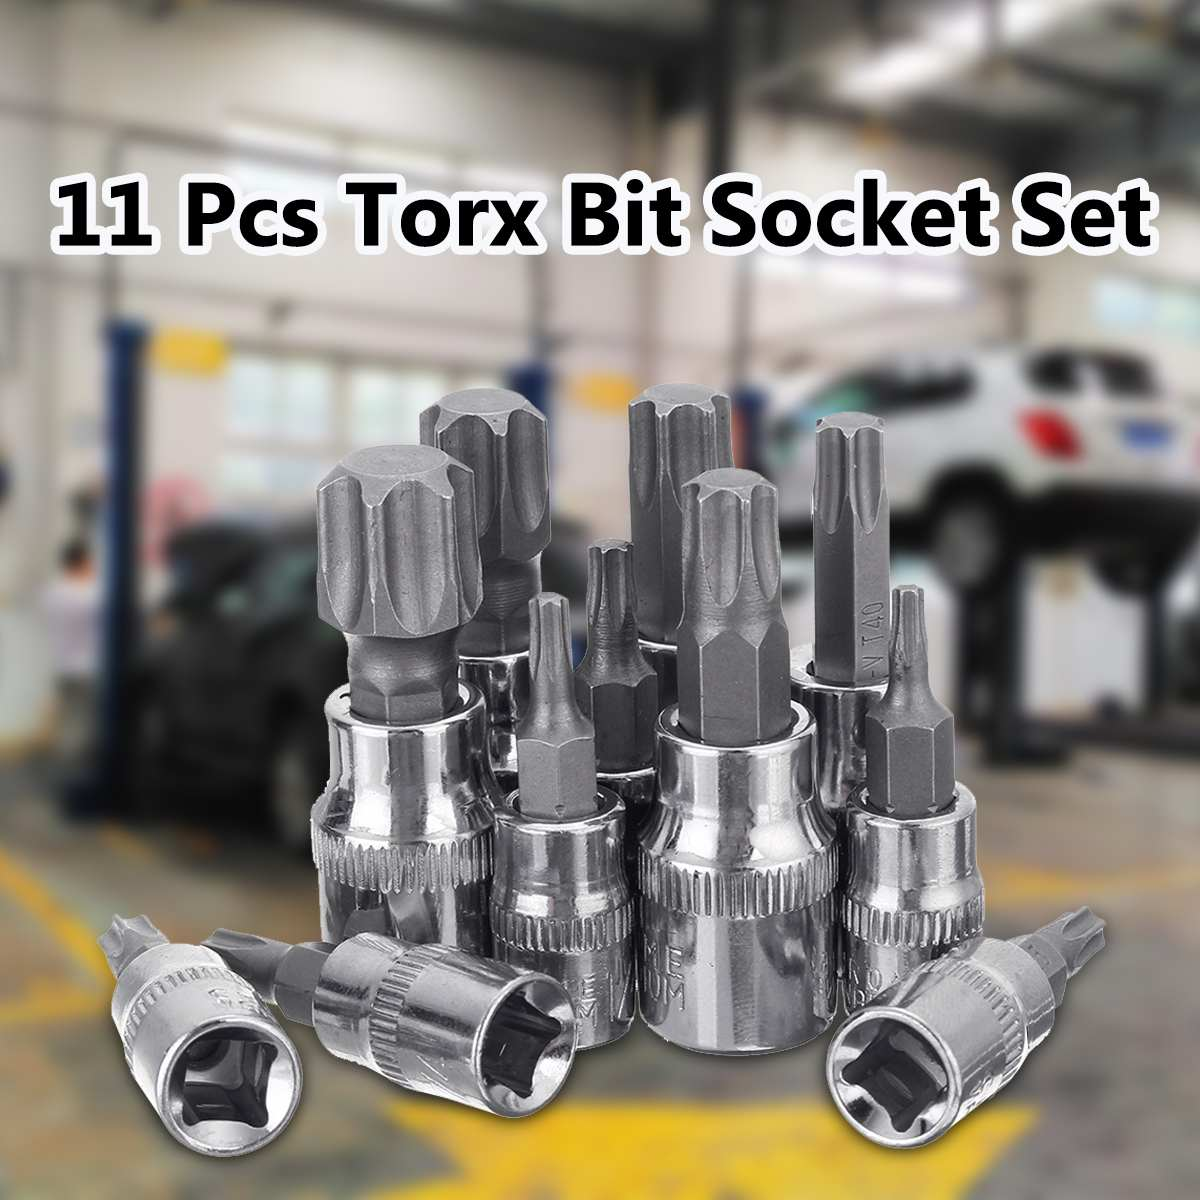 Torx Bit Socket Set T10-T60 Security Tamper Proof With Hole 1/4